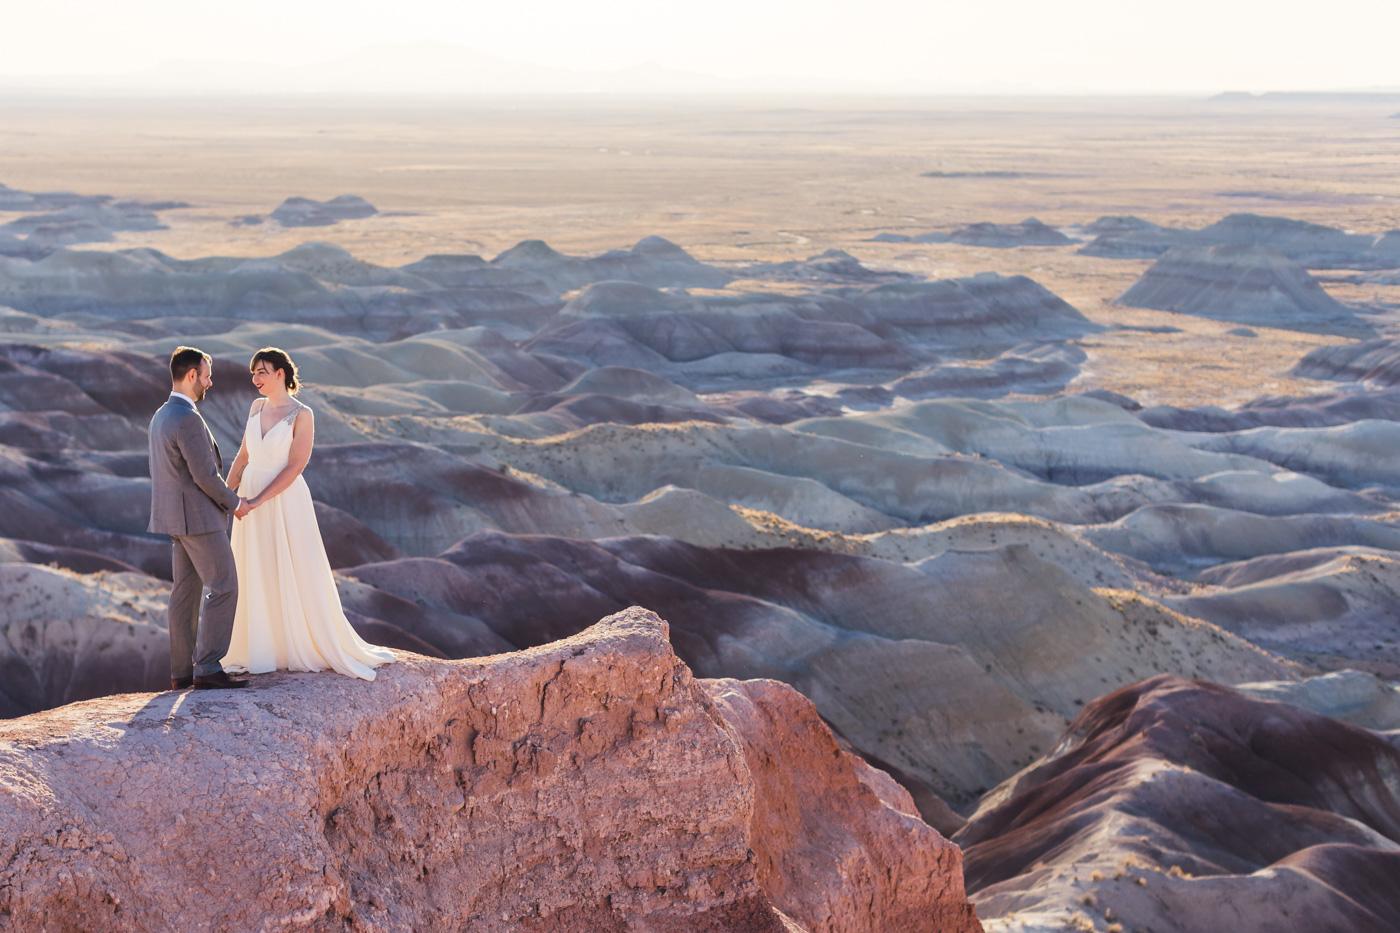 epic-wedding-portrait-little-painted-desert